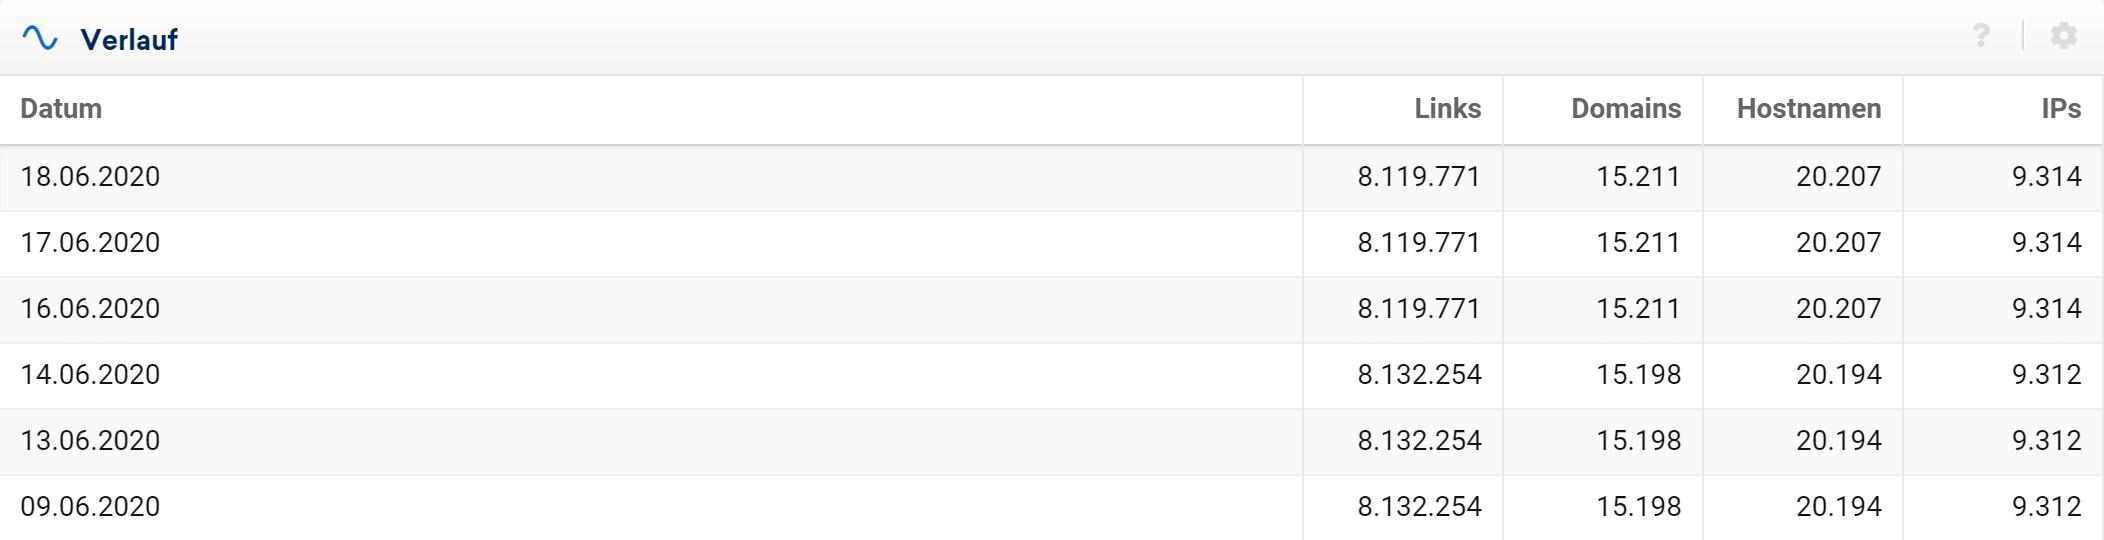 Link-Entwicklung Tabelle in der SISTRIX Toolbox